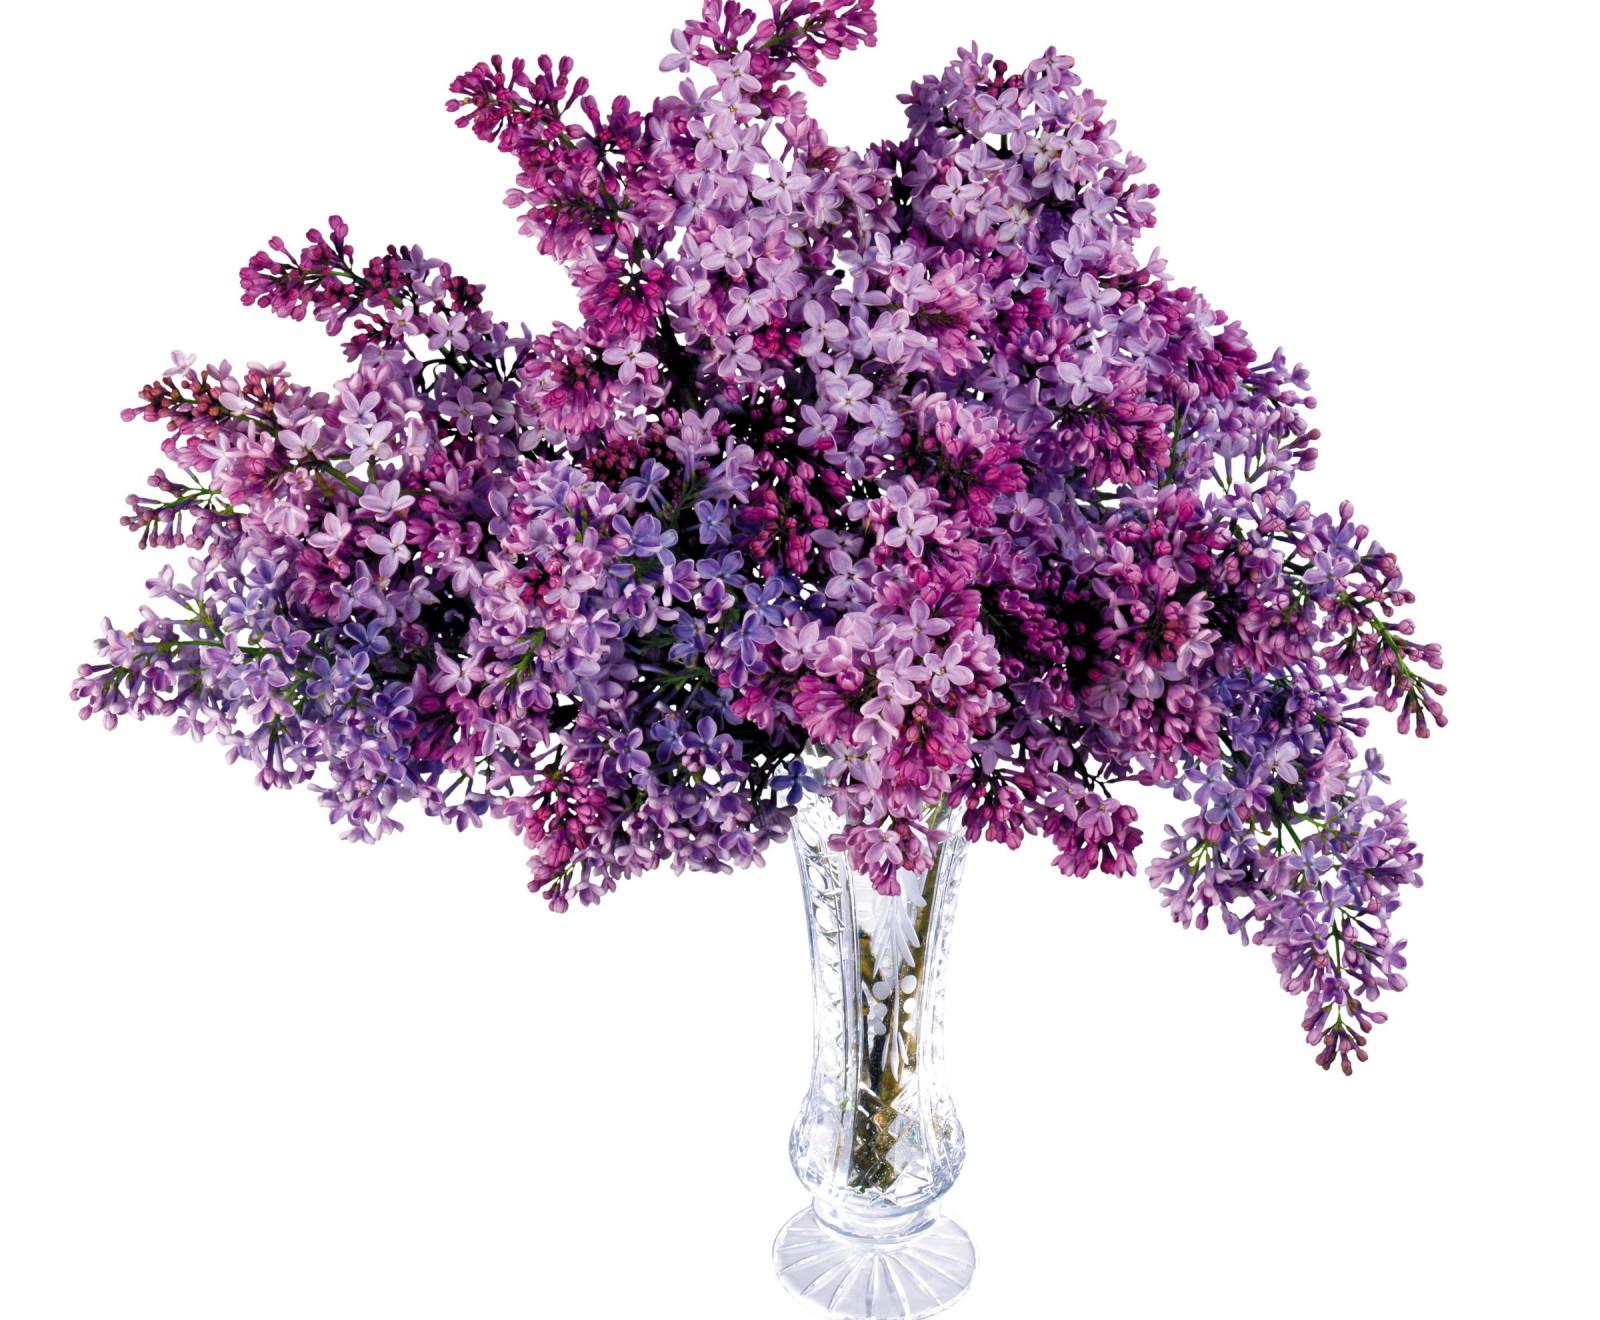 Hintergrundbilder : Flieder, Bündel, Vase, Frühling